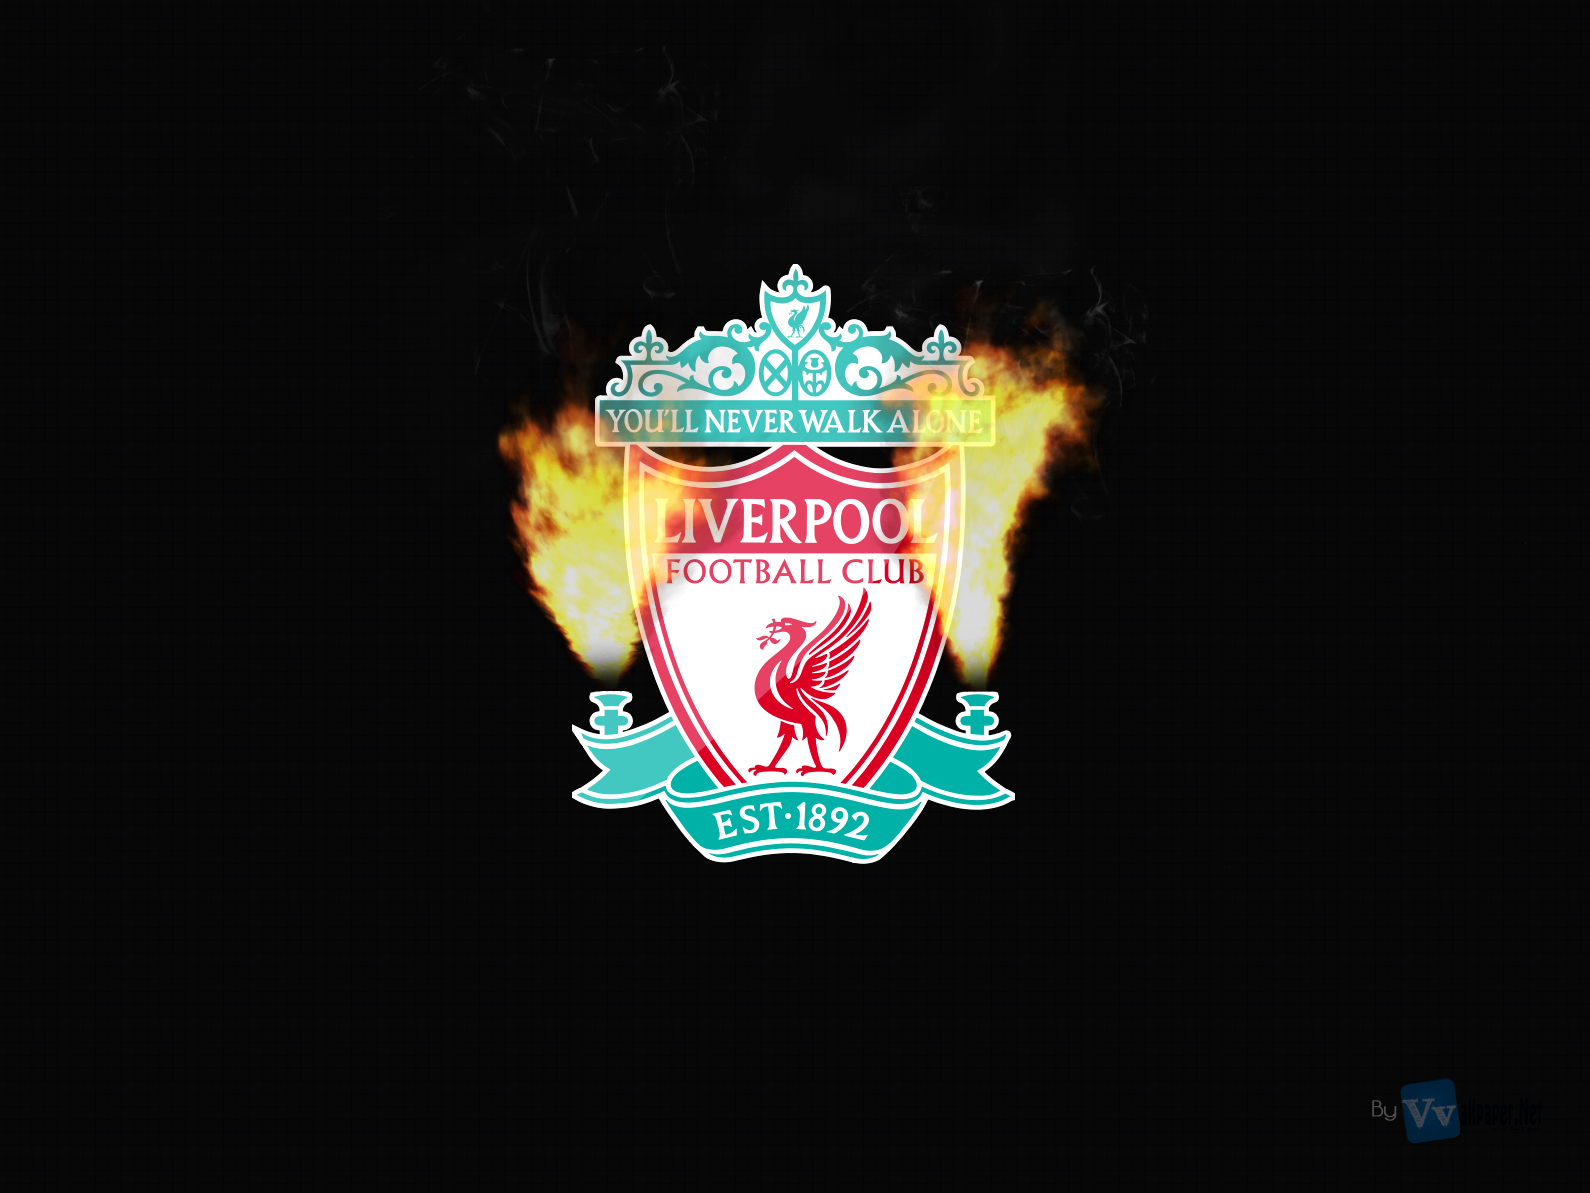 http://4.bp.blogspot.com/-X0Rvc1yRuUI/UI_cZkYU8XI/AAAAAAAAFug/mlZLn3i6sBw/s1600/Liverpool-Football-Club-Logo-Flames-HD-Wallpaper_by_Vvallpaper.Net.jpg